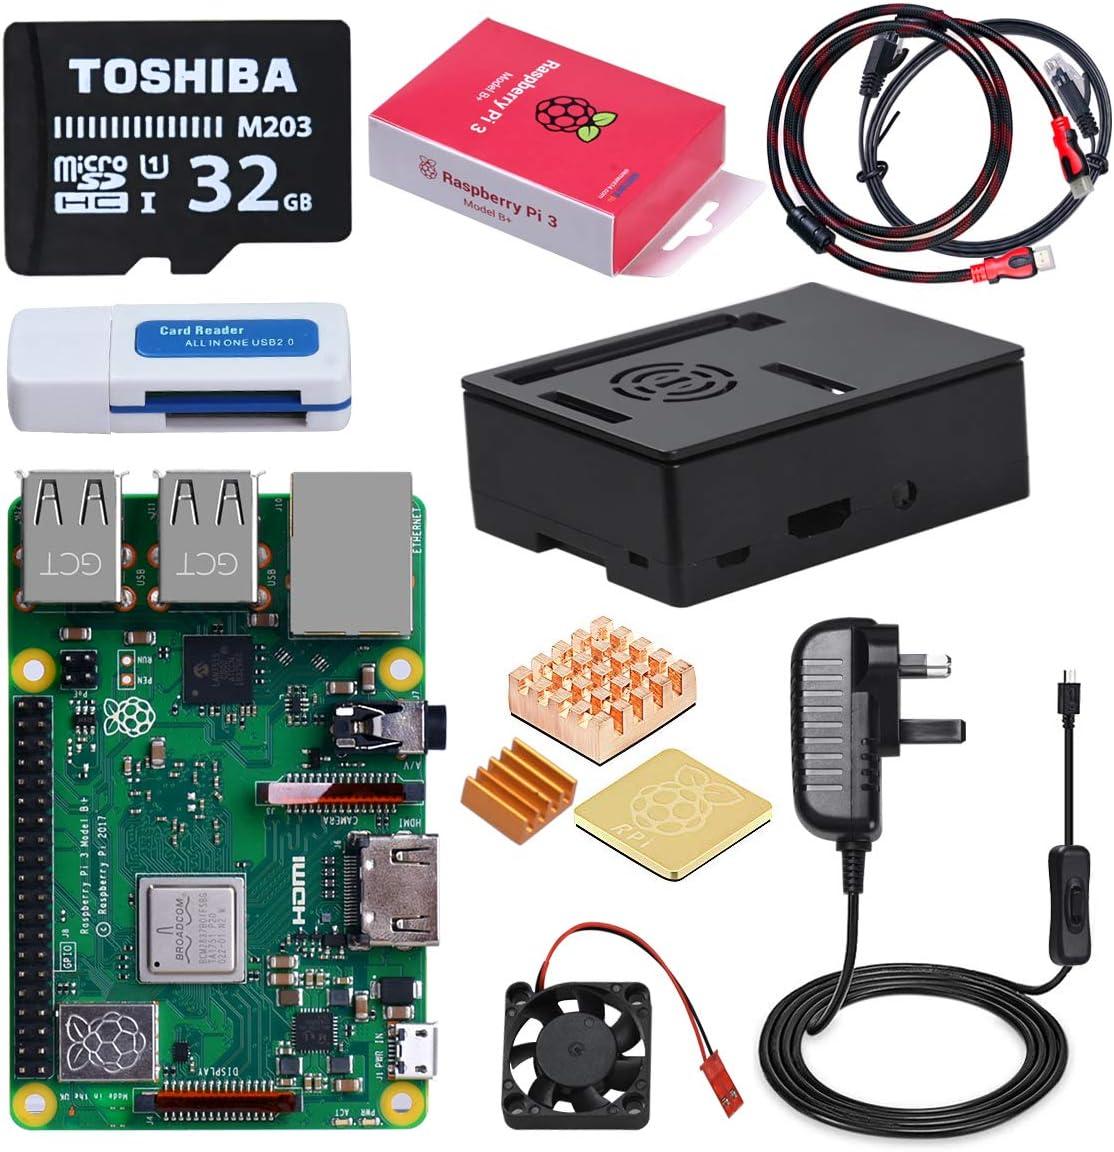 DINOKA Raspberry Pi 3 B+ Starter Kit con Micro SD de 32GB Clase 10, 5V 2.5A Adaptador de Corriente con Interruptor, 3 Radiadores, Cable HDMI, Caja de Calidad, Lector de Tarjetas, Retículo